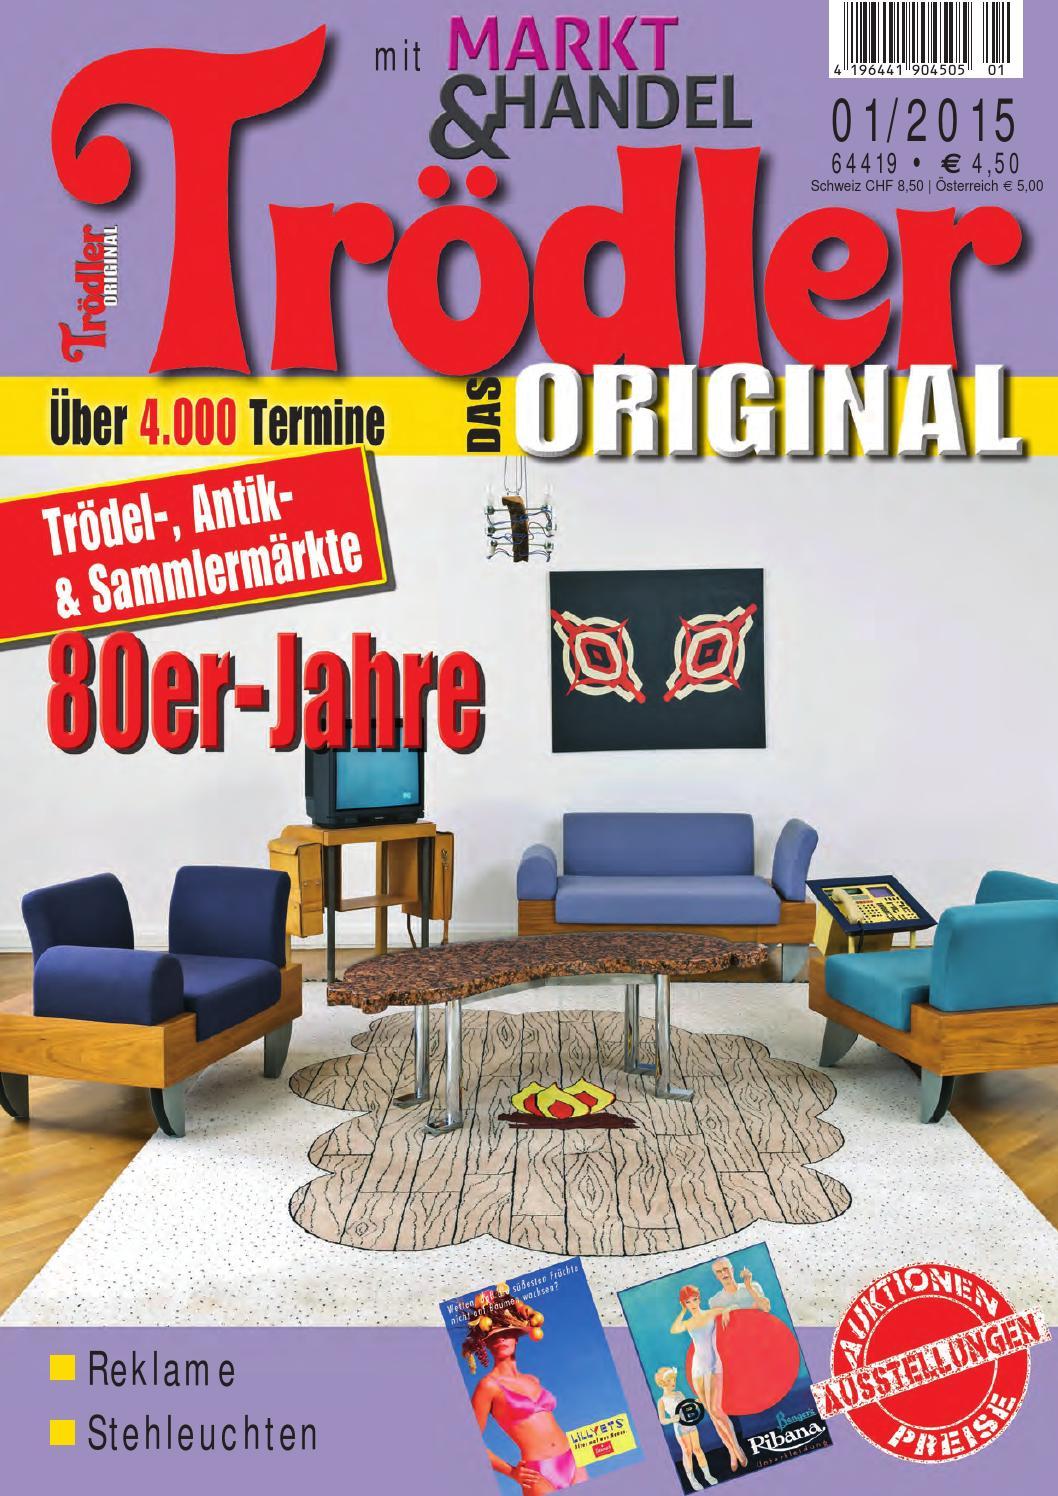 Verlags Issuu Gmbh 0115 By Gemi Troedler j34Aq5RL